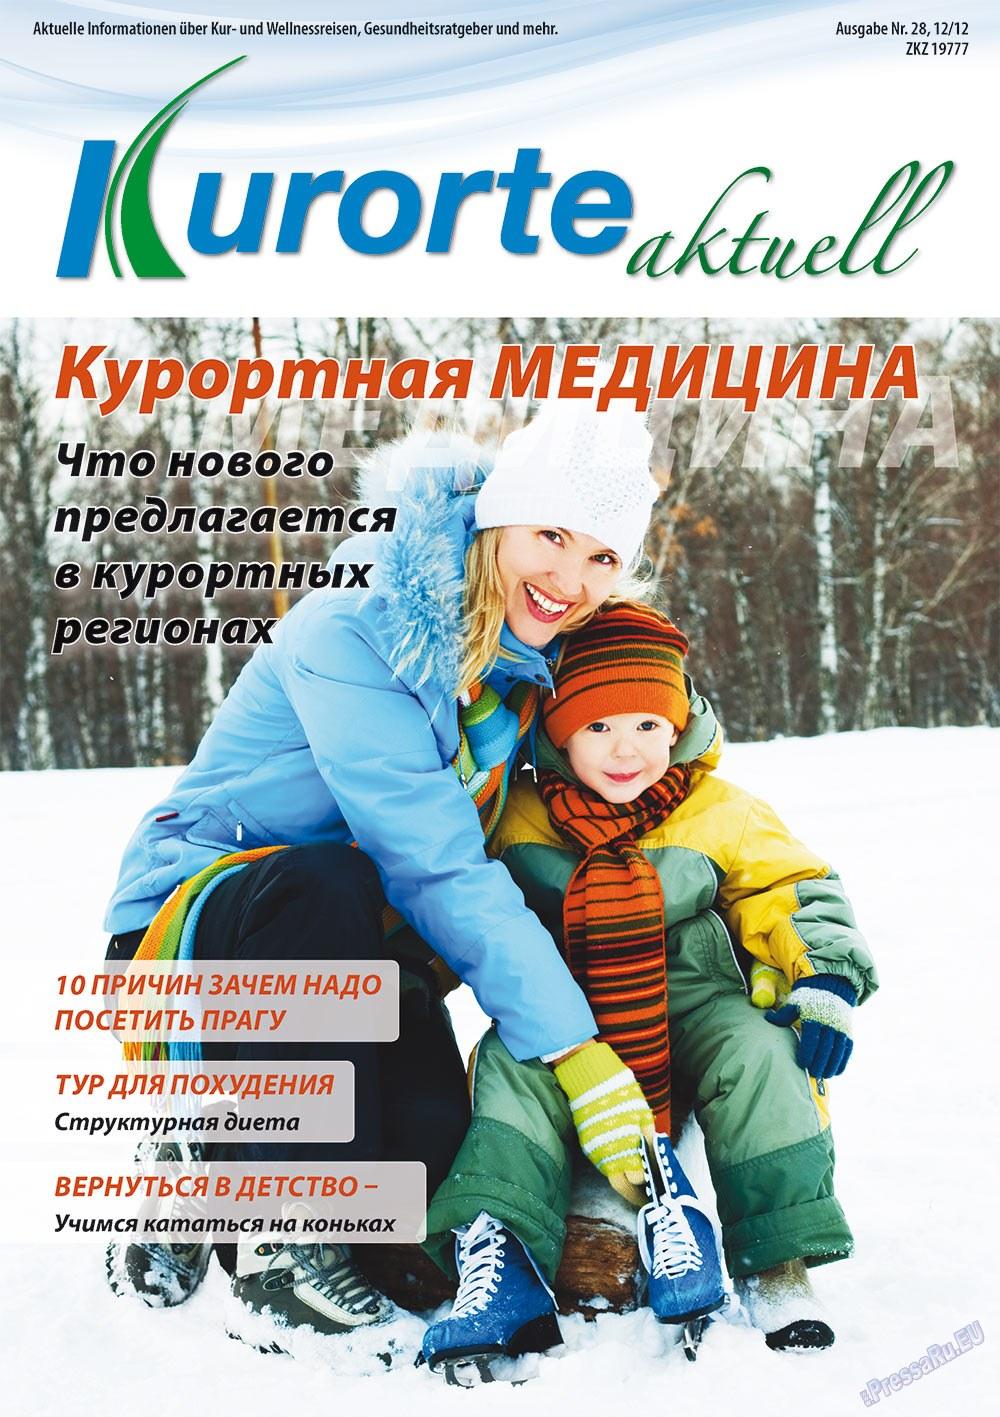 Kurorte aktuell (газета). 2012 год, номер 28, стр. 1